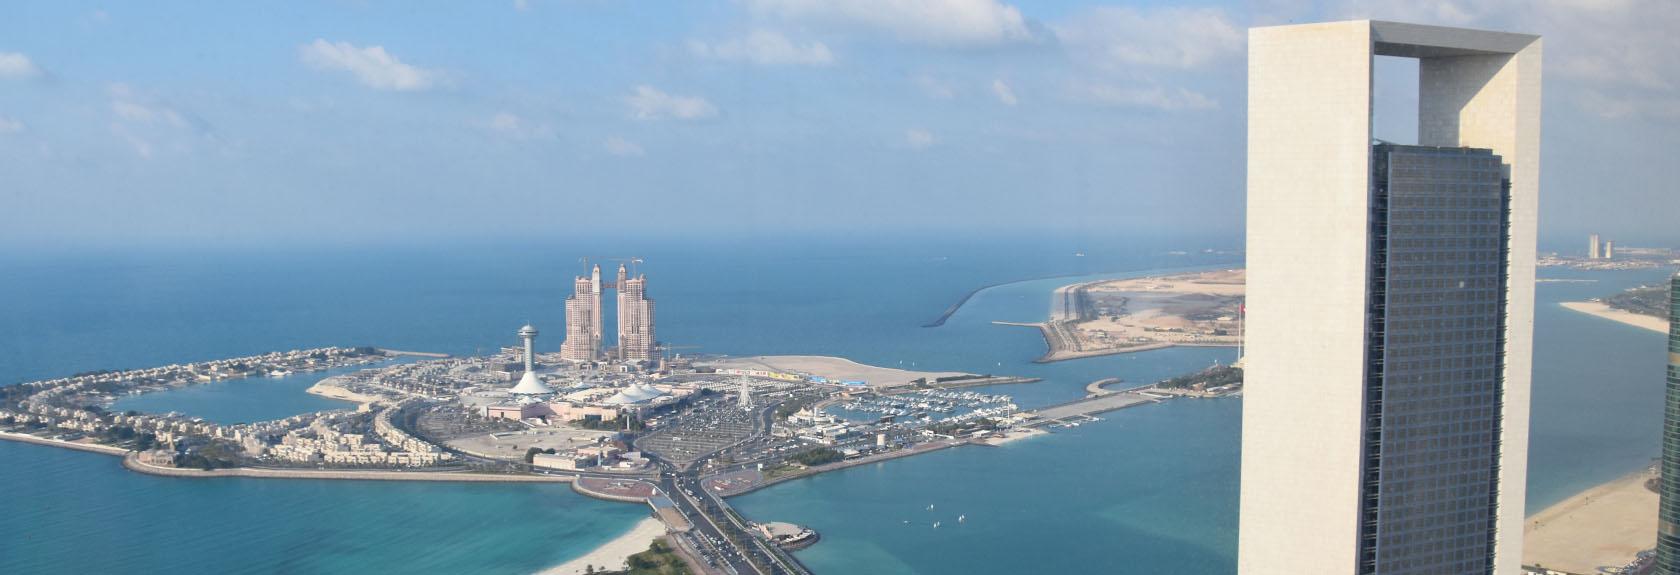 Eendaagse Abu Dhabi highlights tour vanuit Dubai